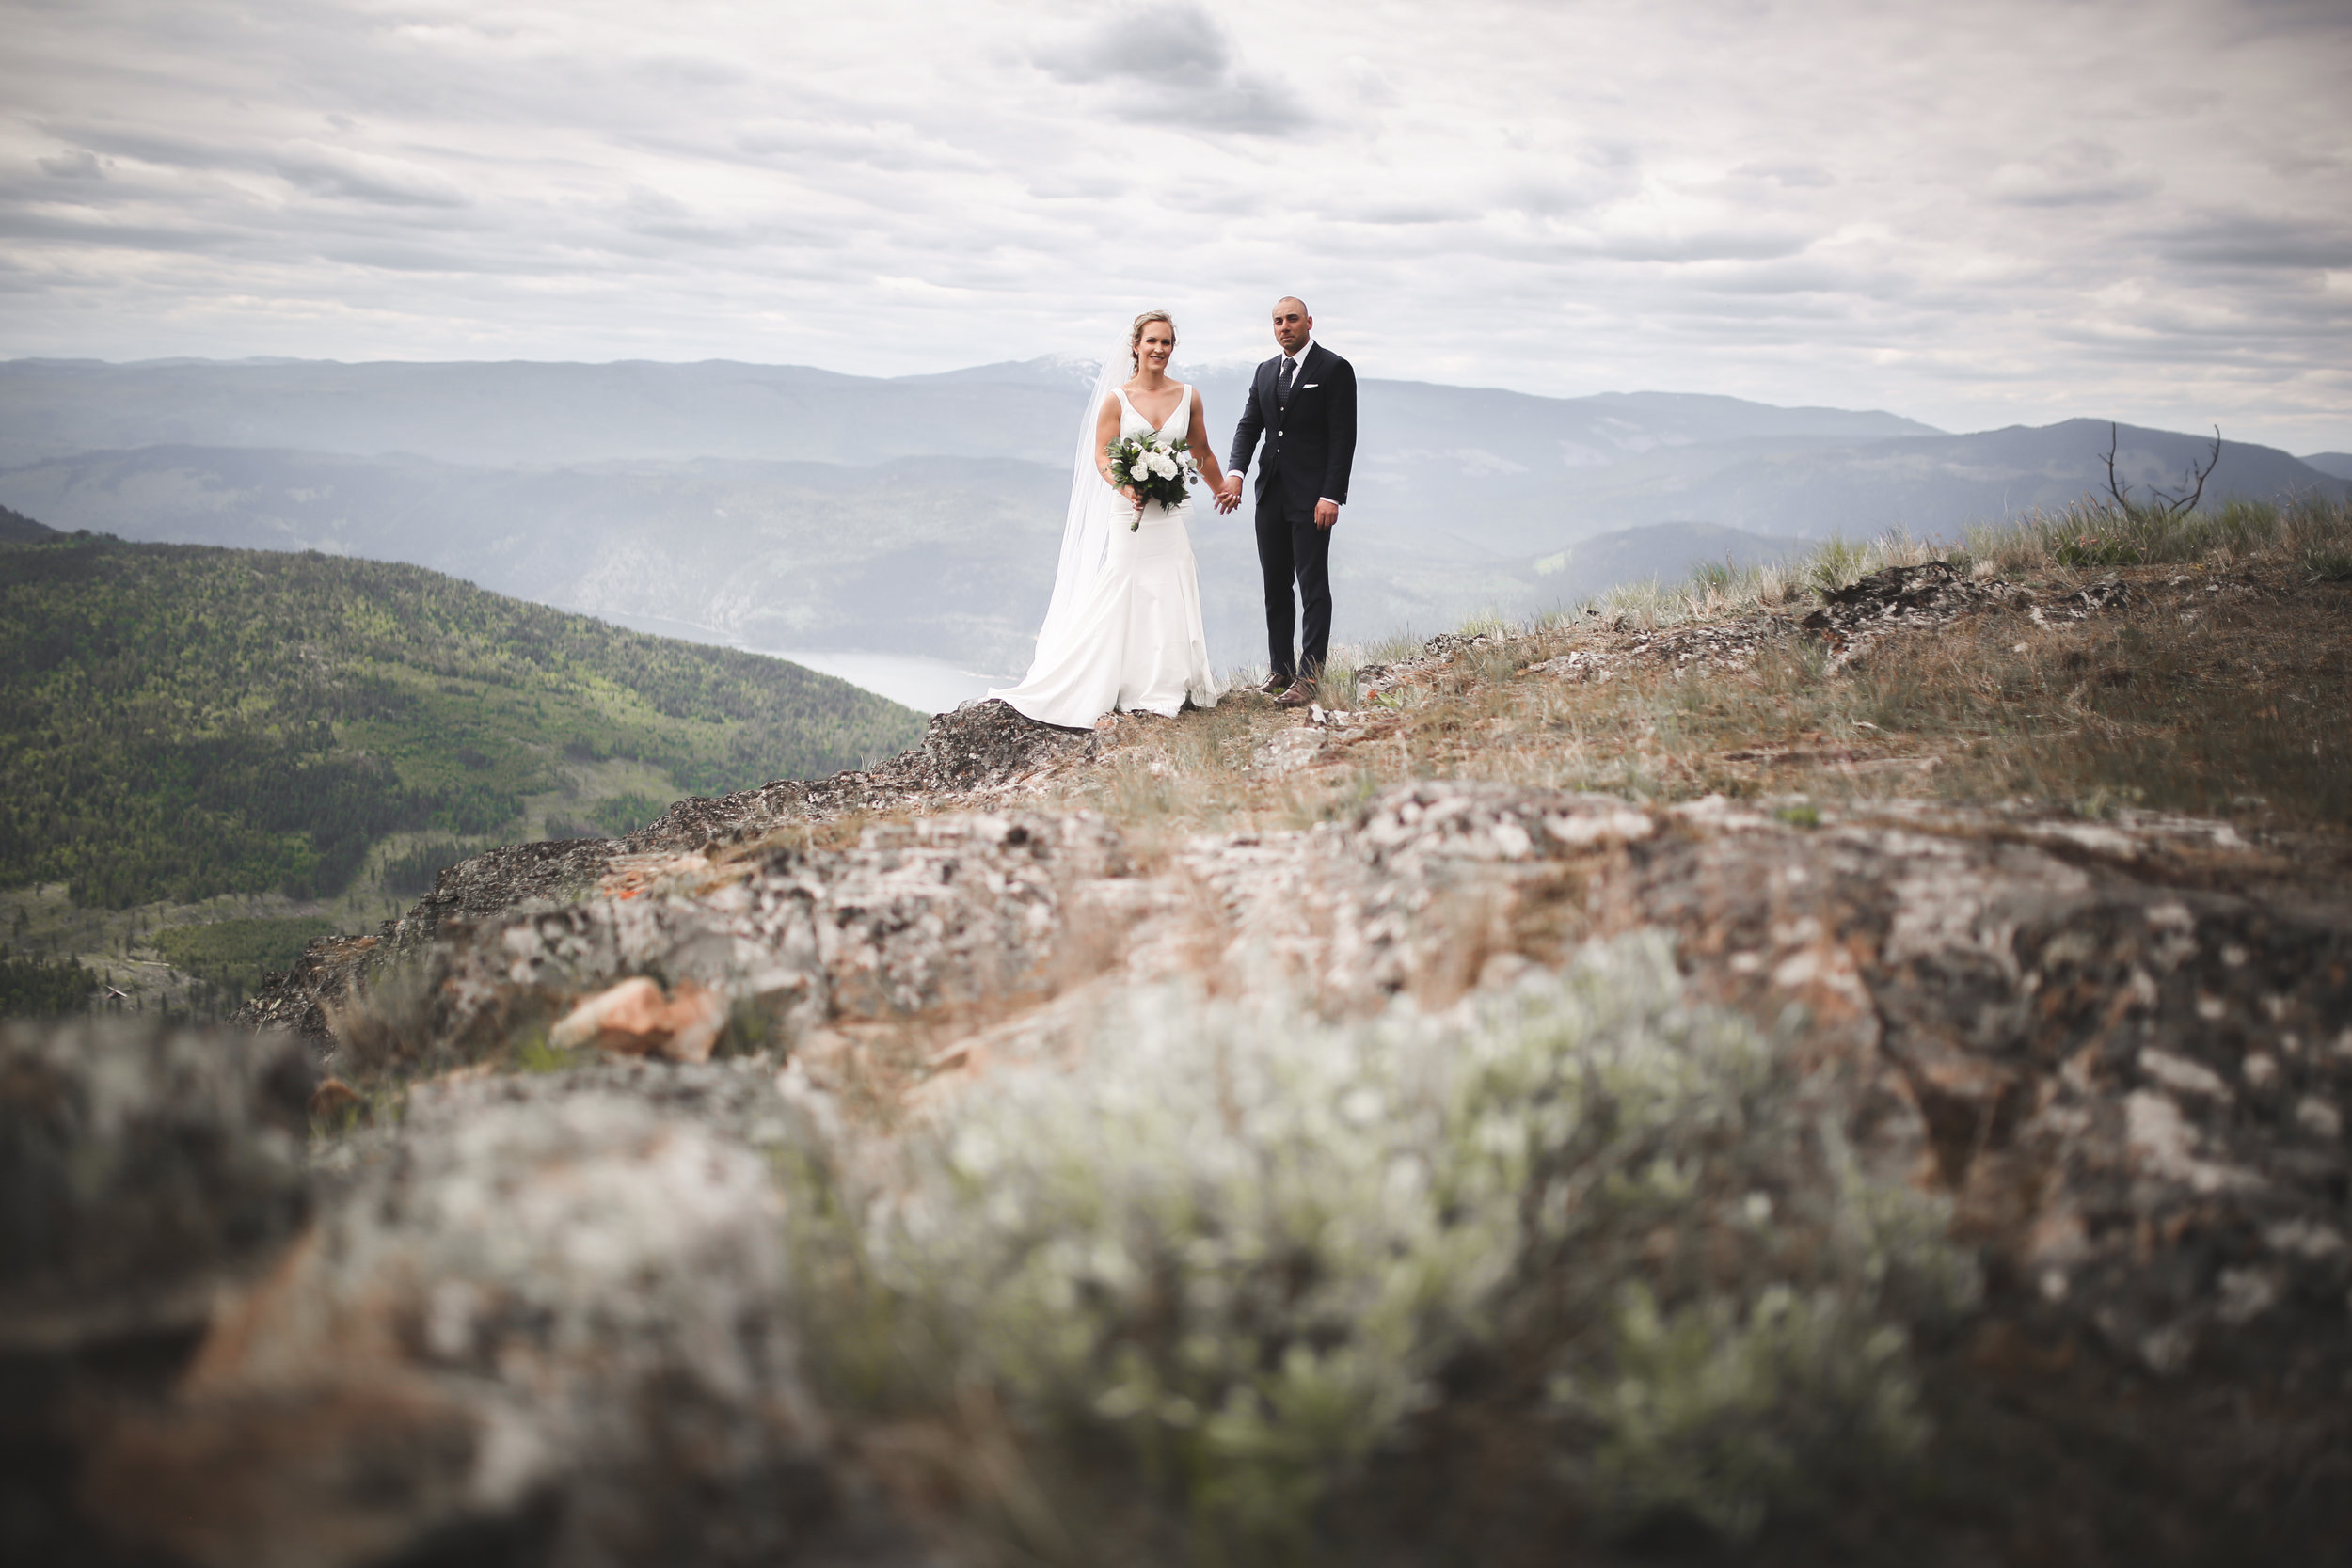 163 Adam Ziorio Photography - Kate & Ben's Wedding.jpg